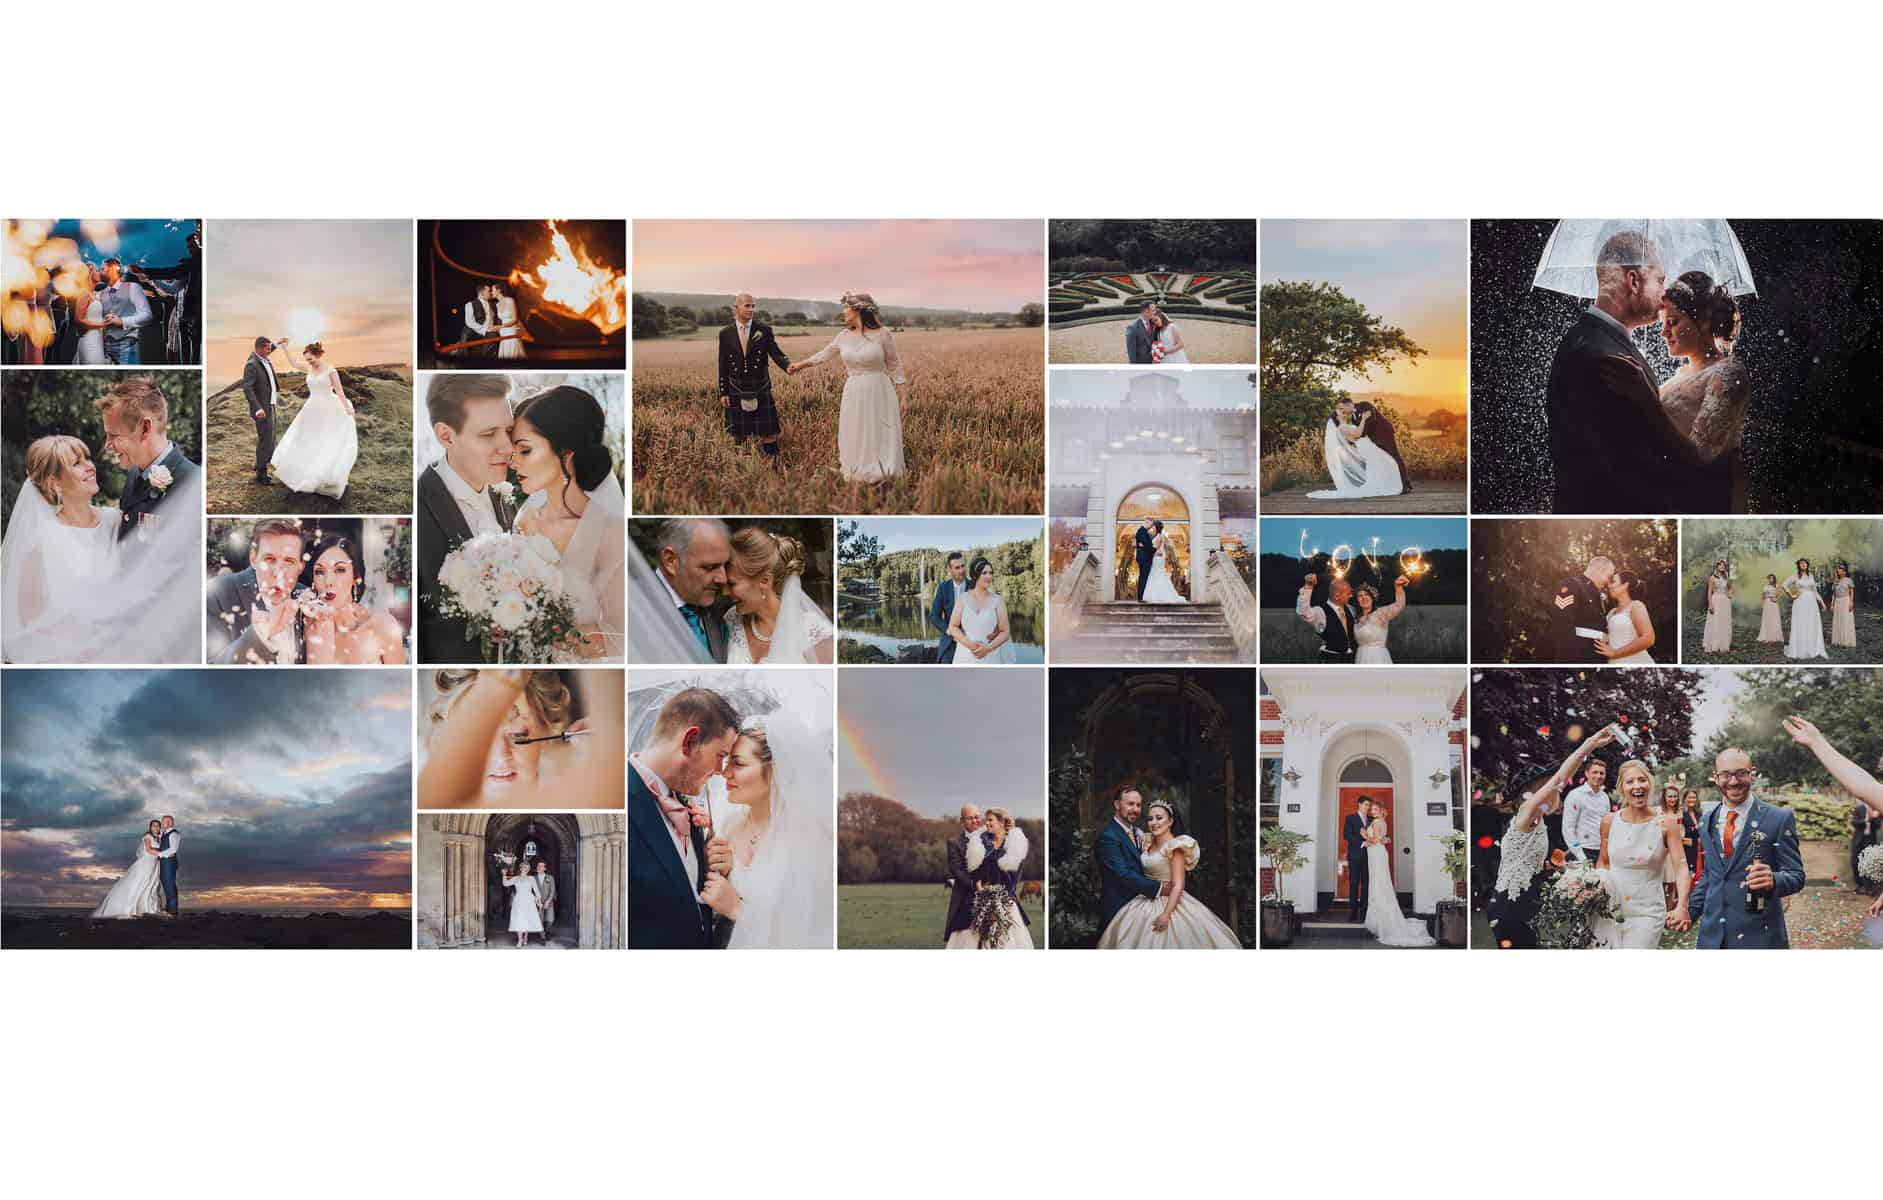 2017 weddings website cover